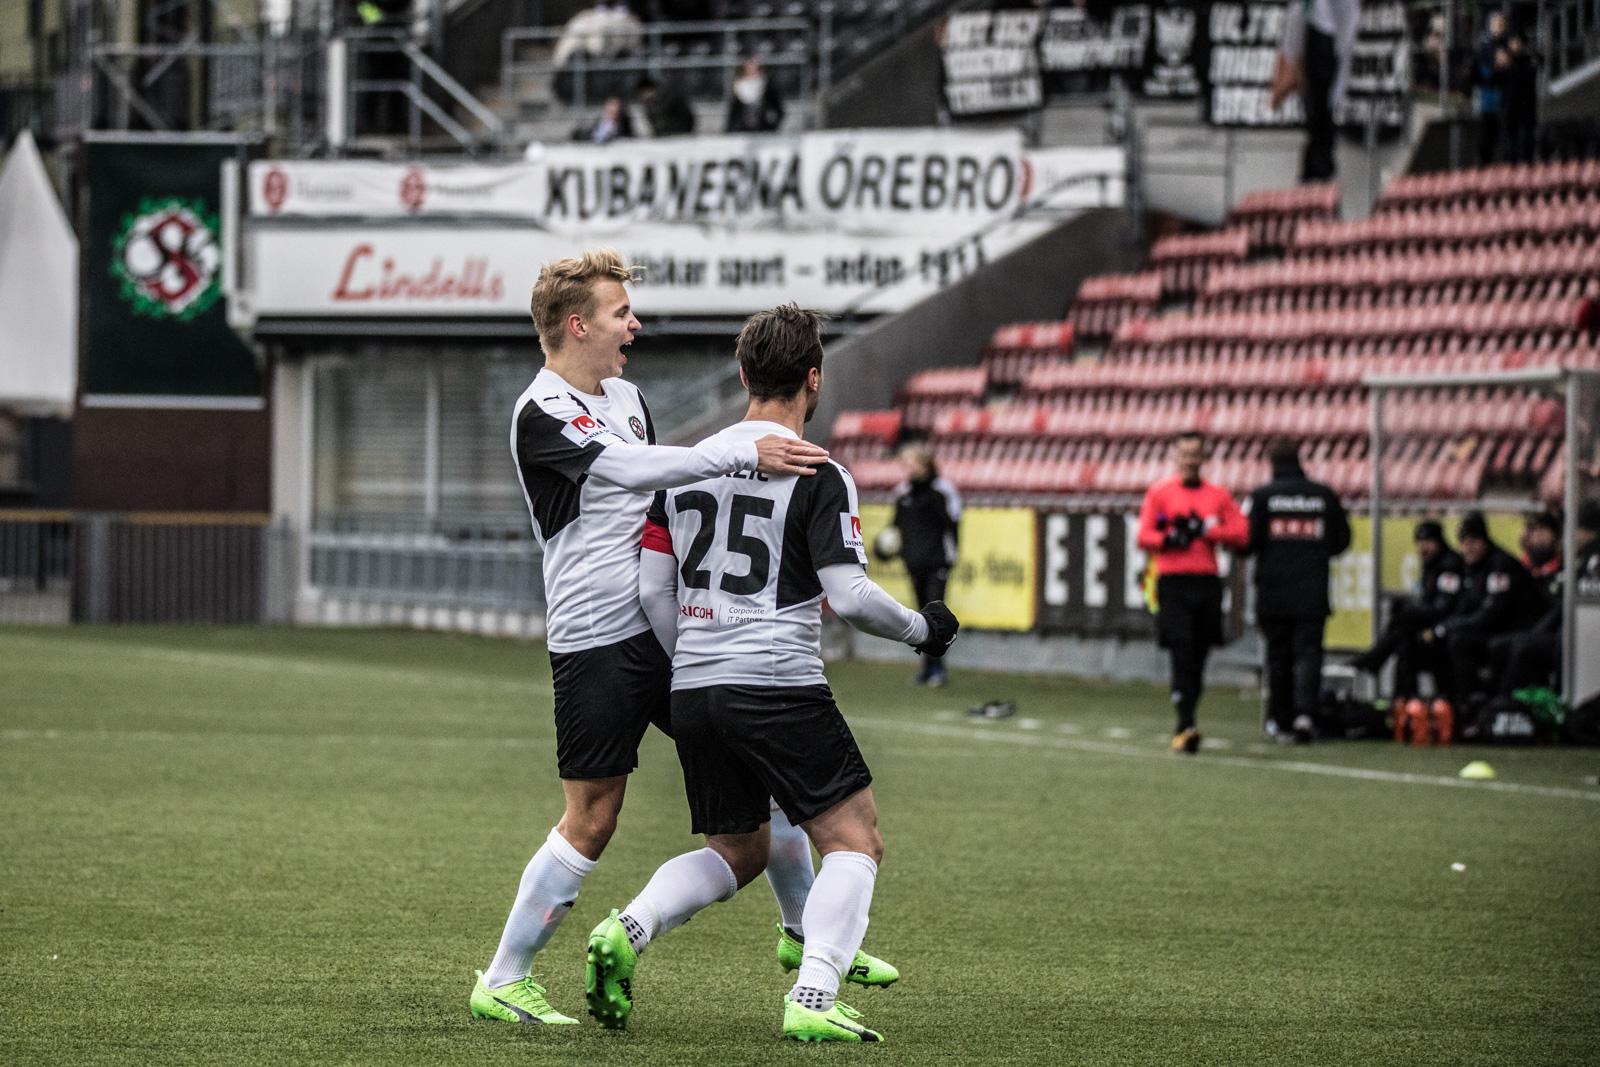 Orebro VS Goteborg ( BETTING TIPS, Match Preview & Expert Analysis )™